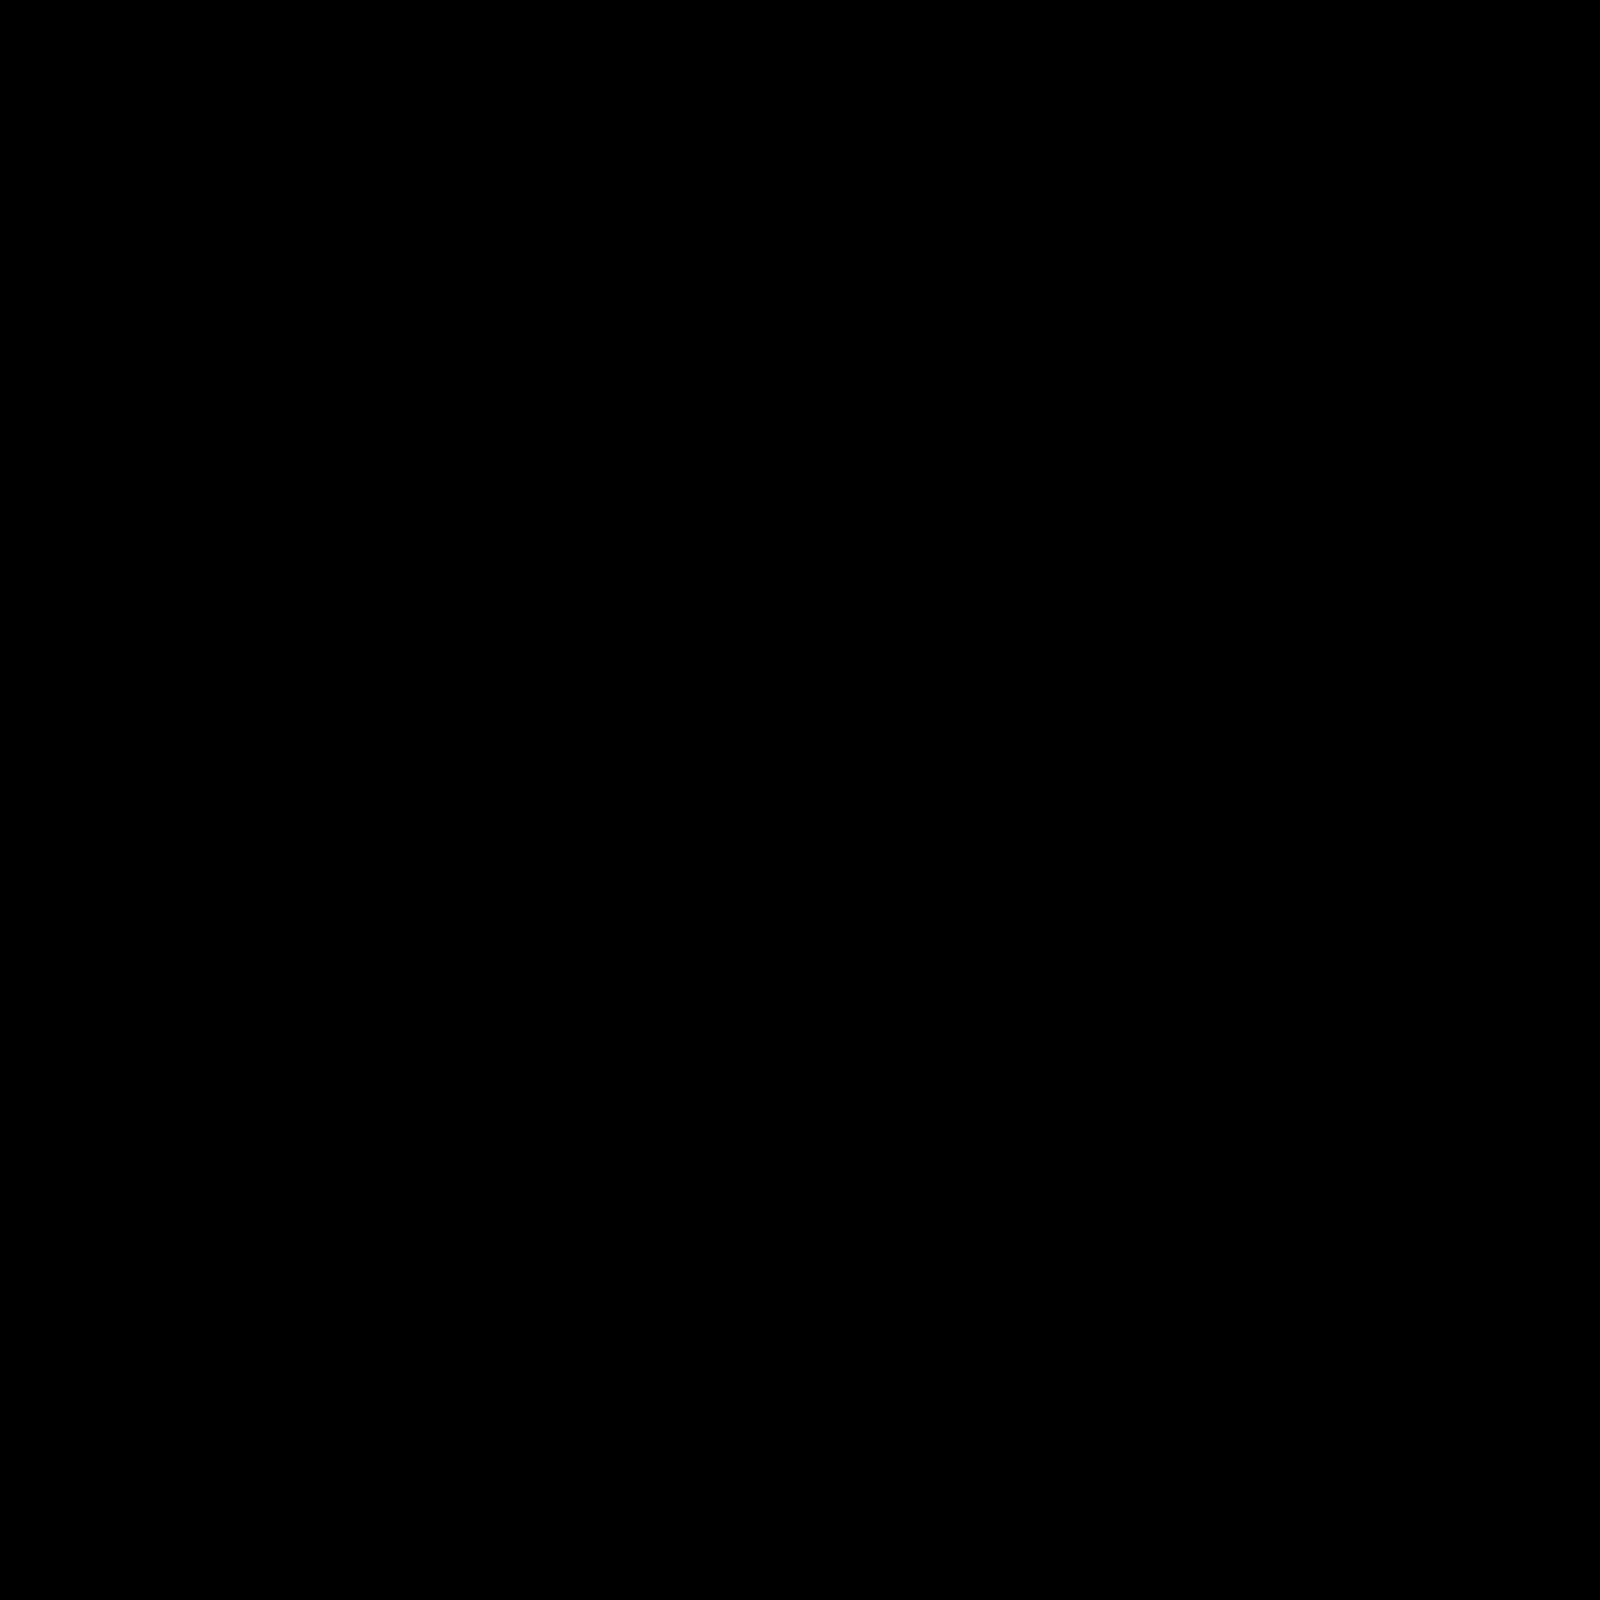 Game Controller Clipart.